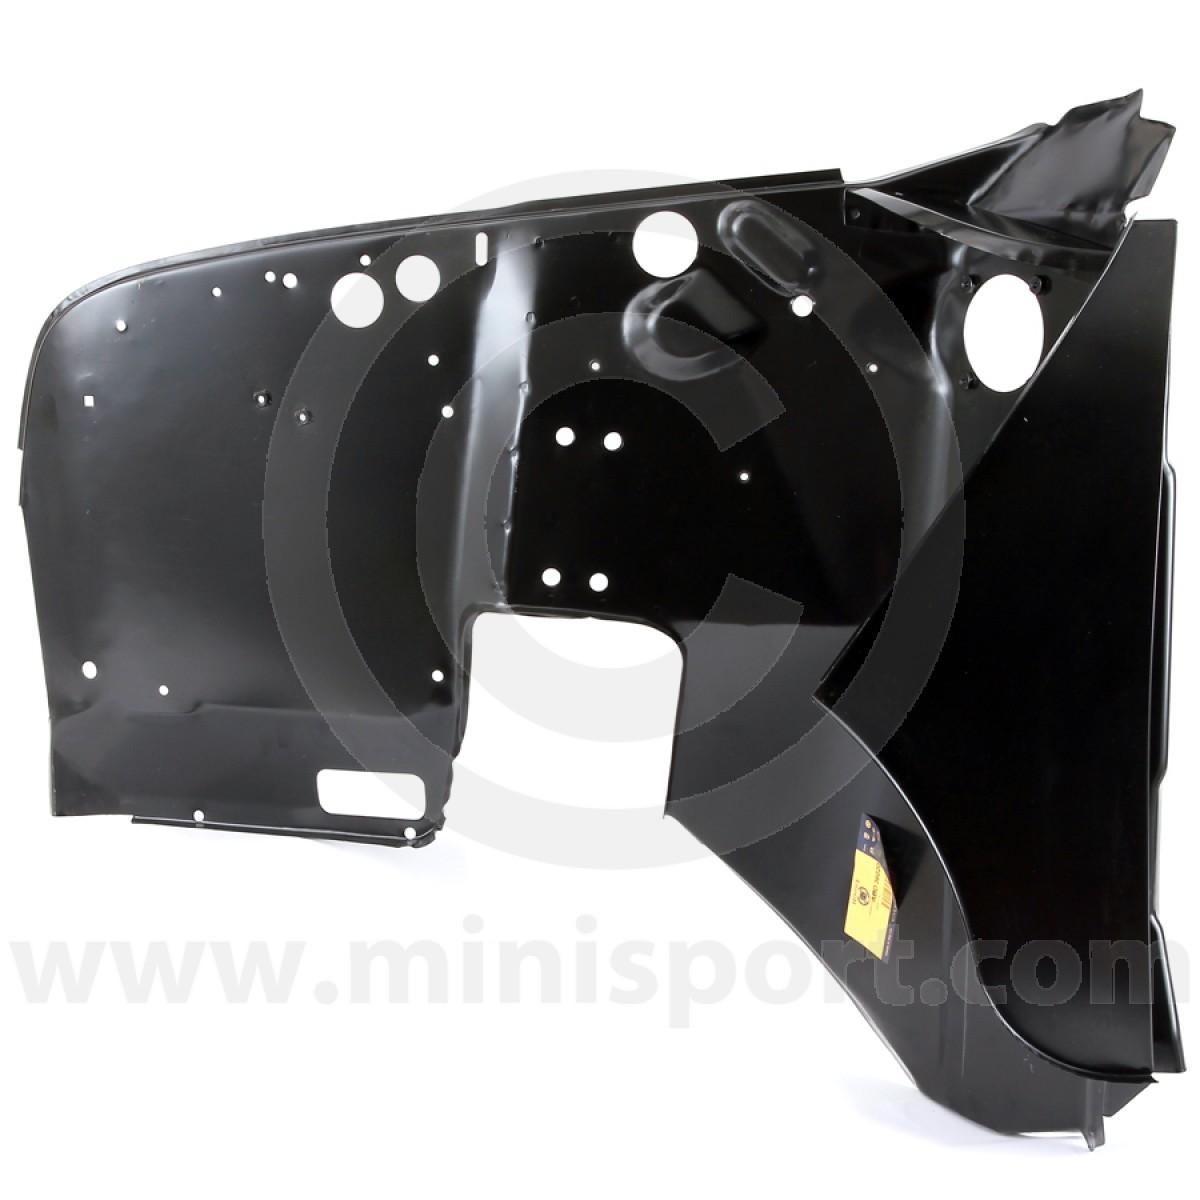 Abd360200 Mini Inner Wing Assembly Body Panels Minisportcom